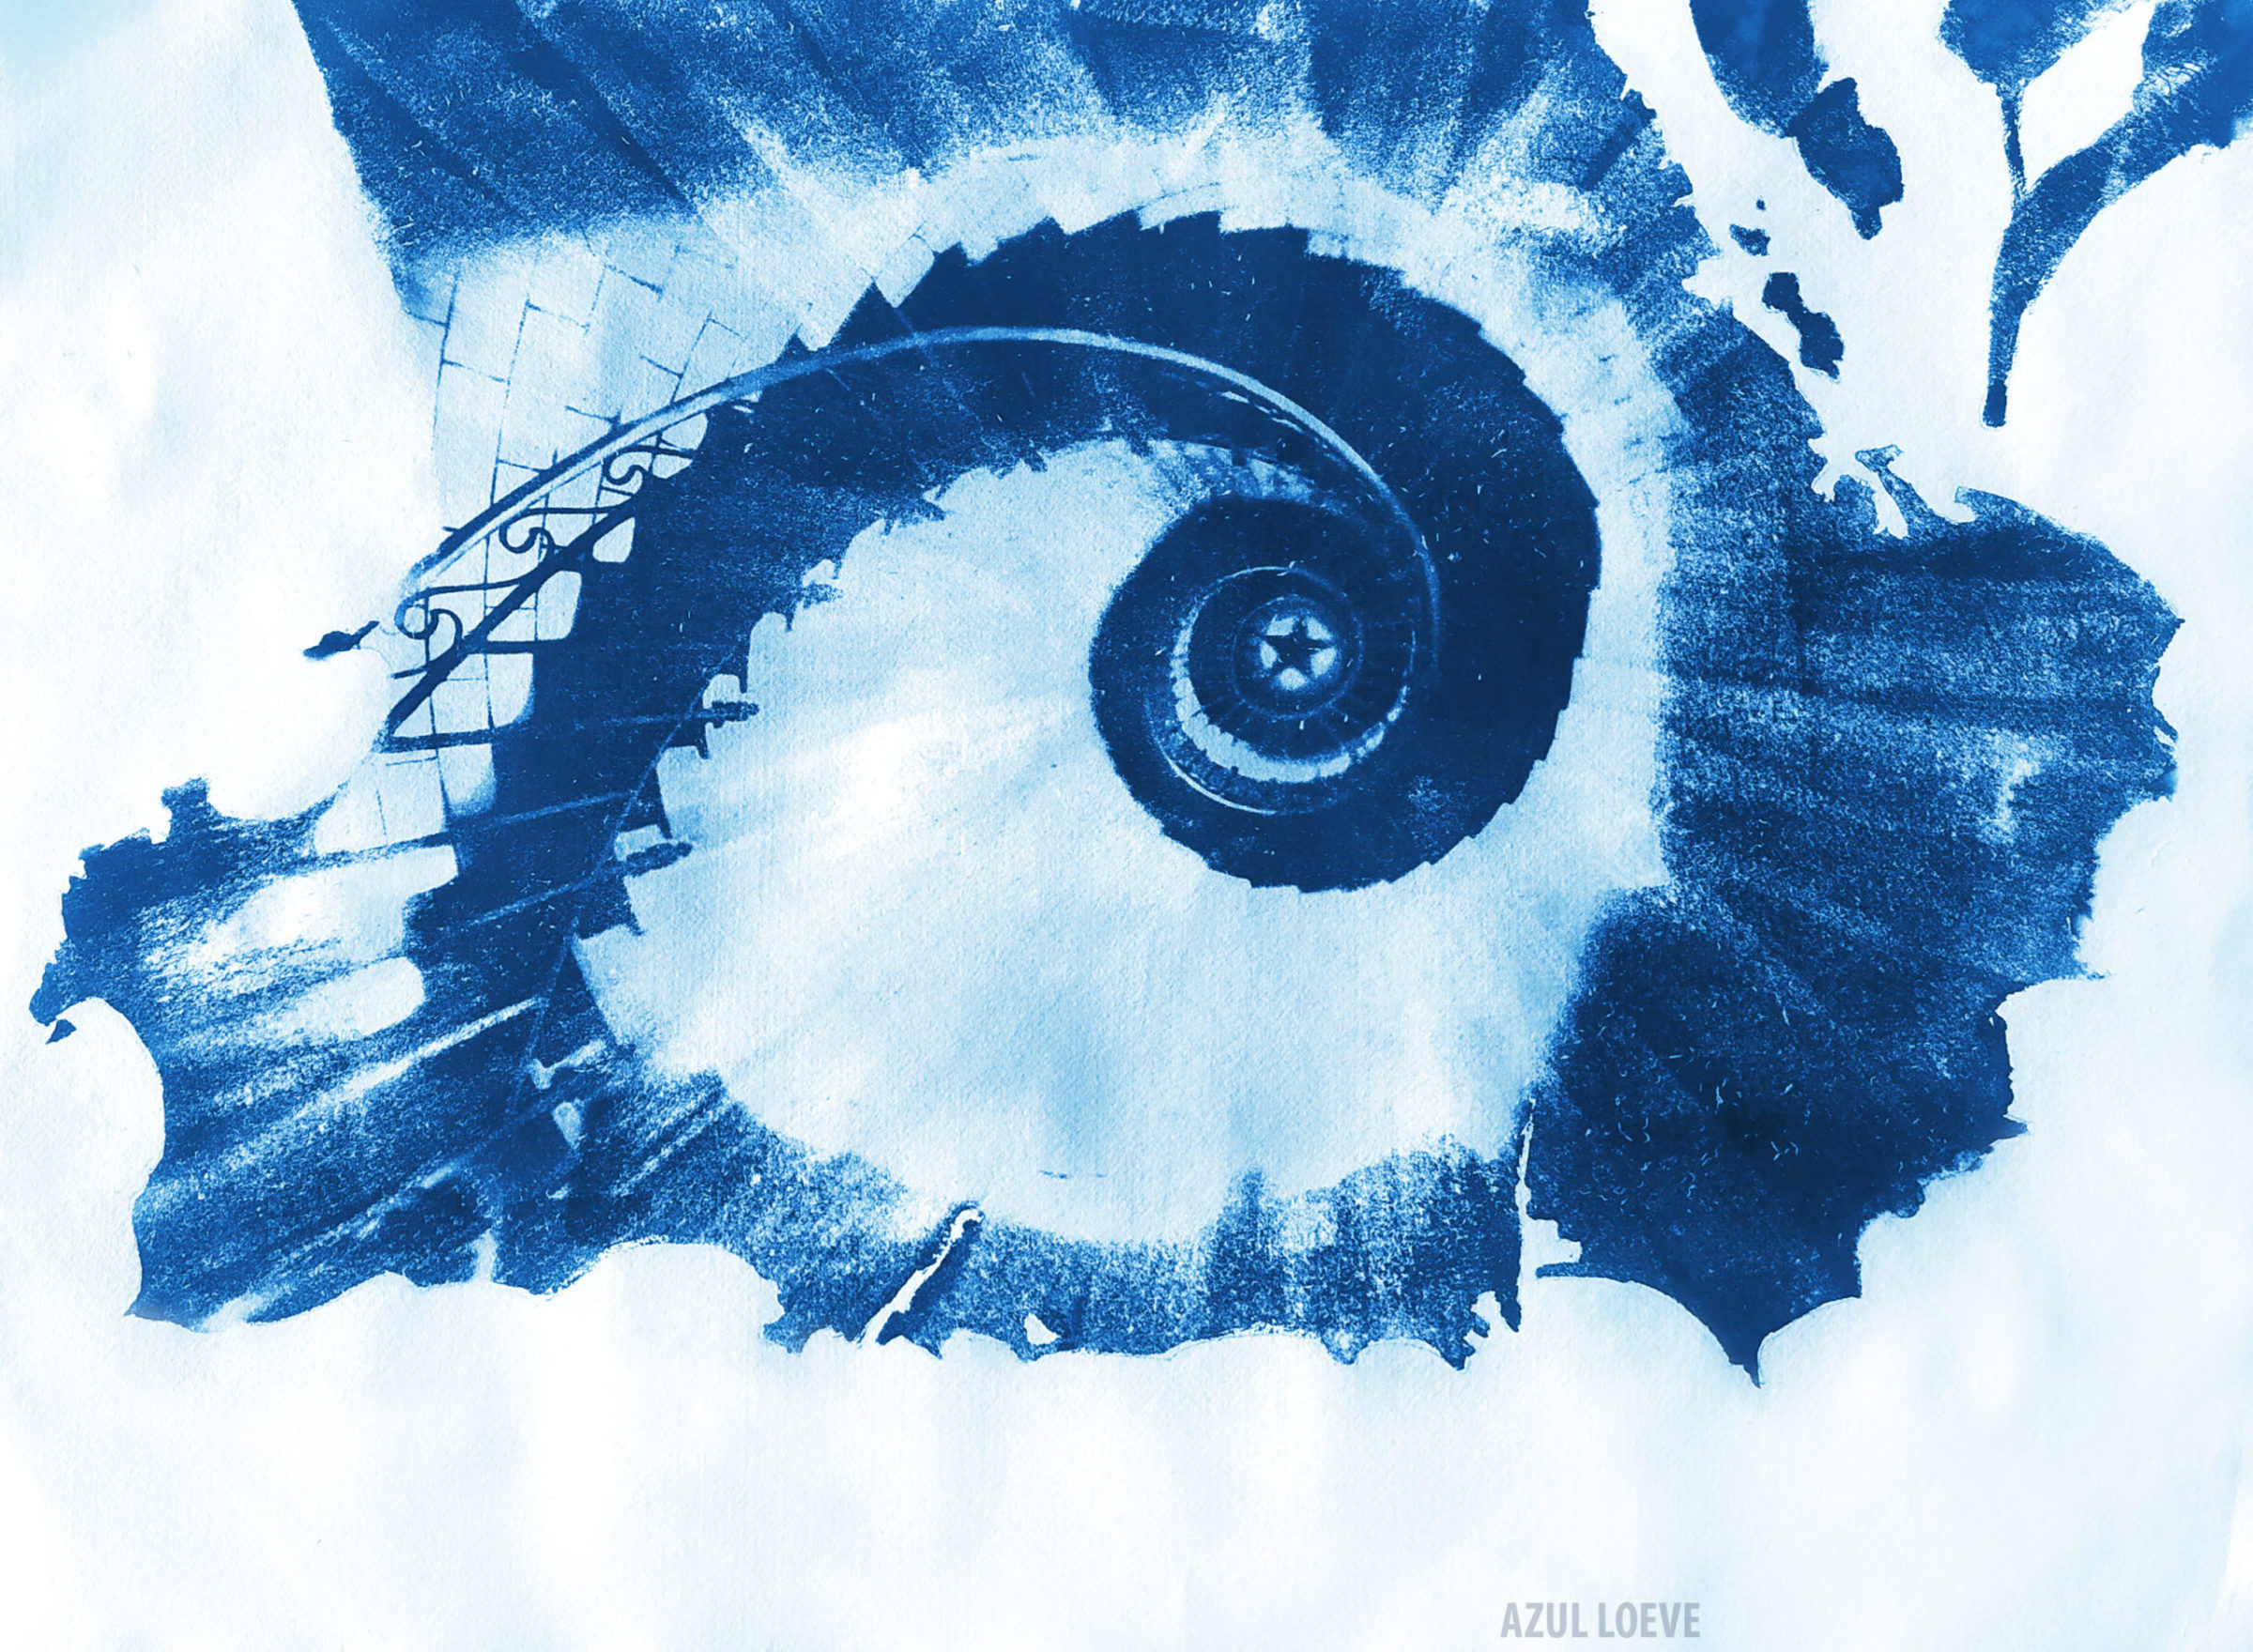 2019_LOEVE_Azul_cyanographie_Sterenn_Eckmuhl_wm